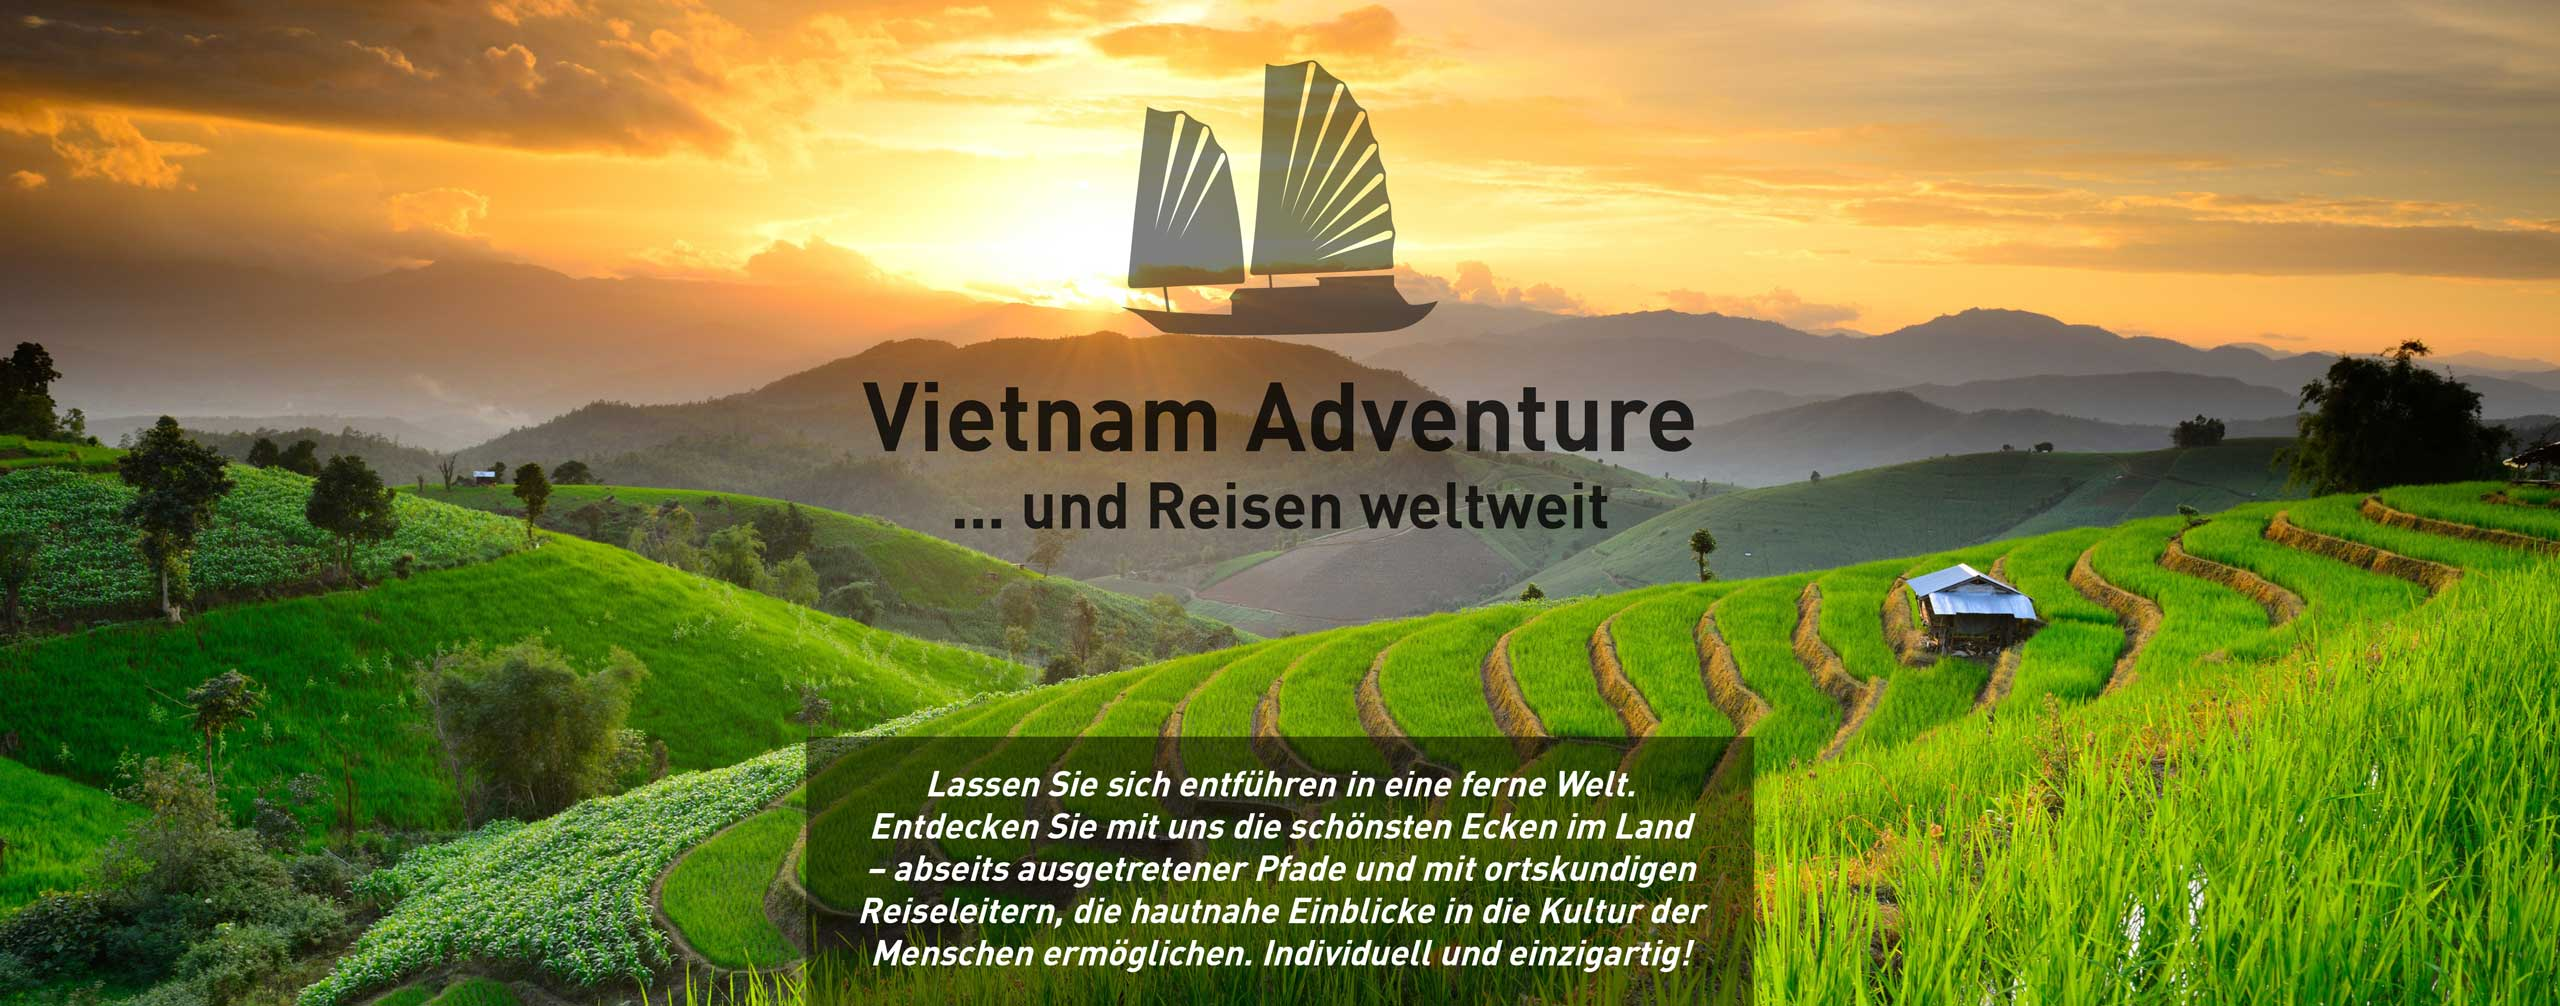 Bild Reisfelder in Vietnam